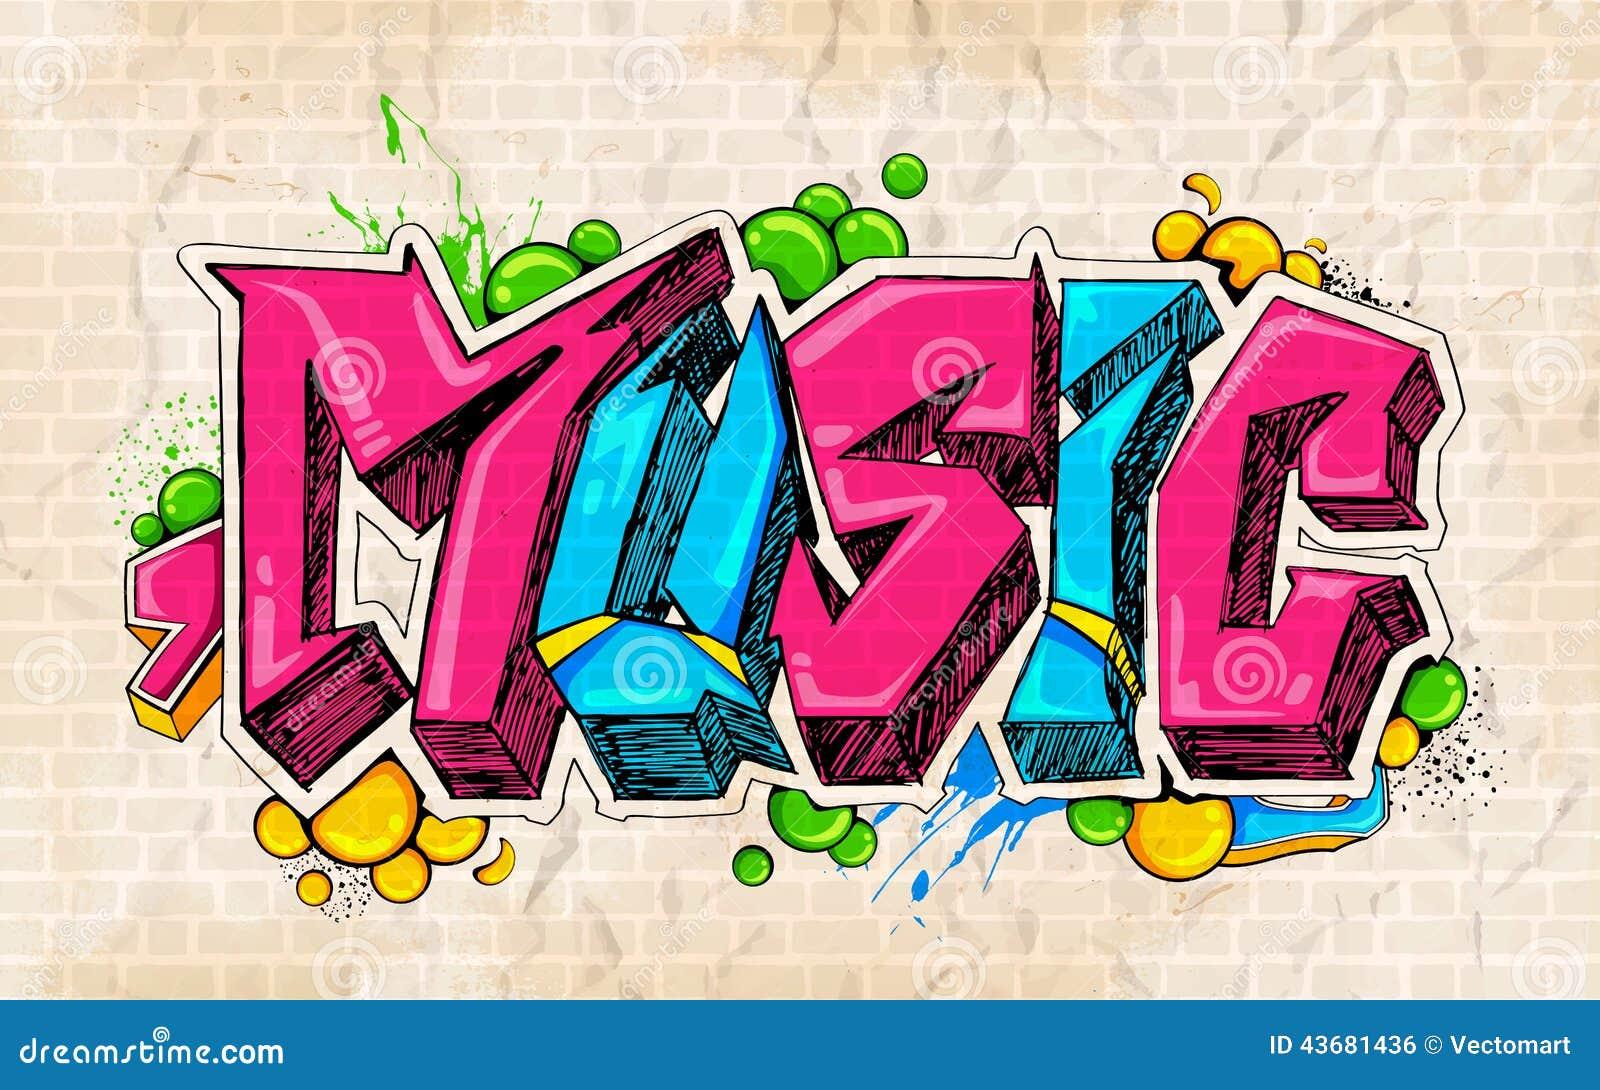 Music Graffiti Wallpapers: Graffiti Style Music Background Stock Vector